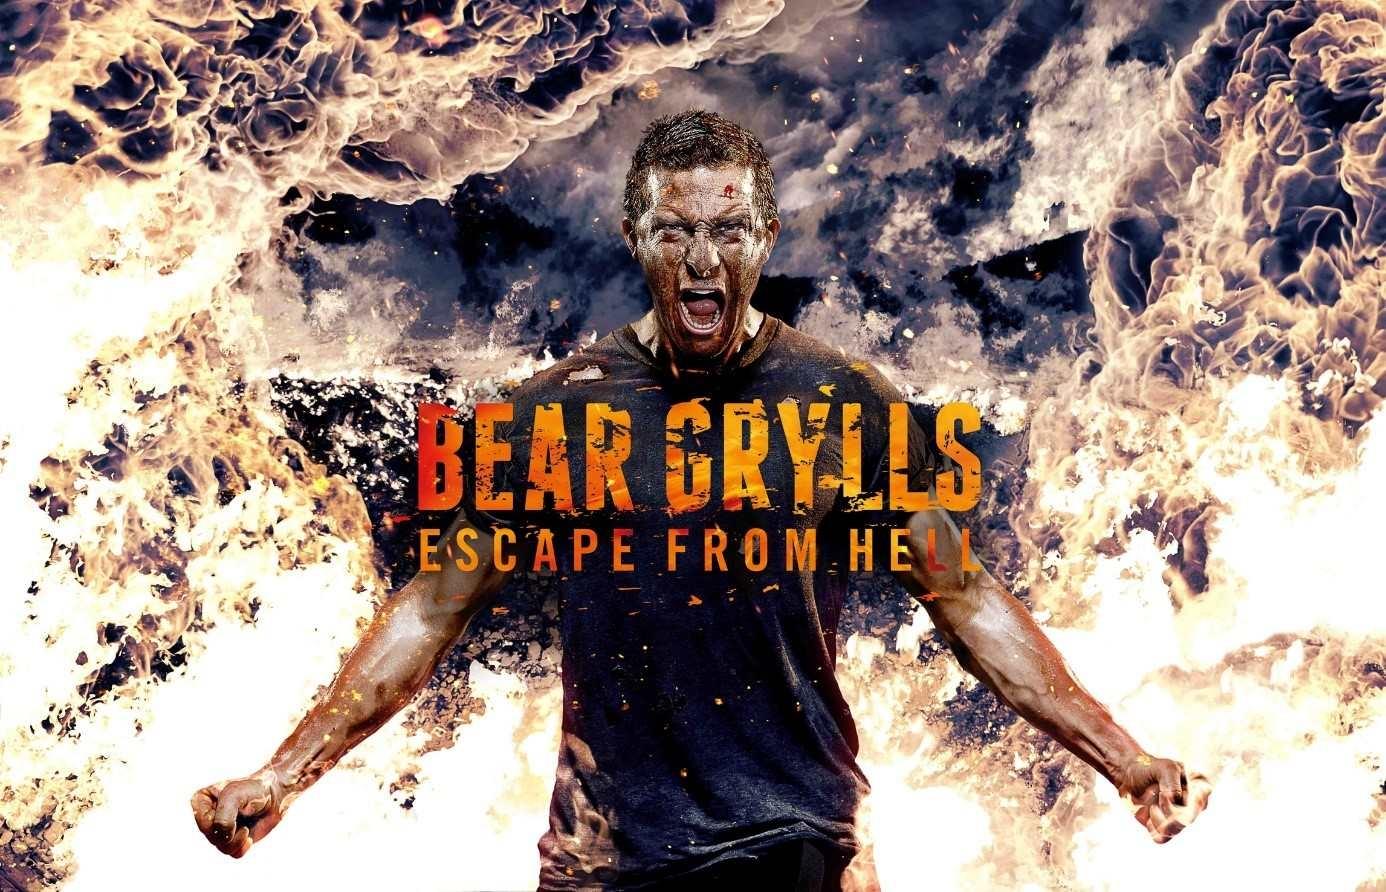 7-bear-hell